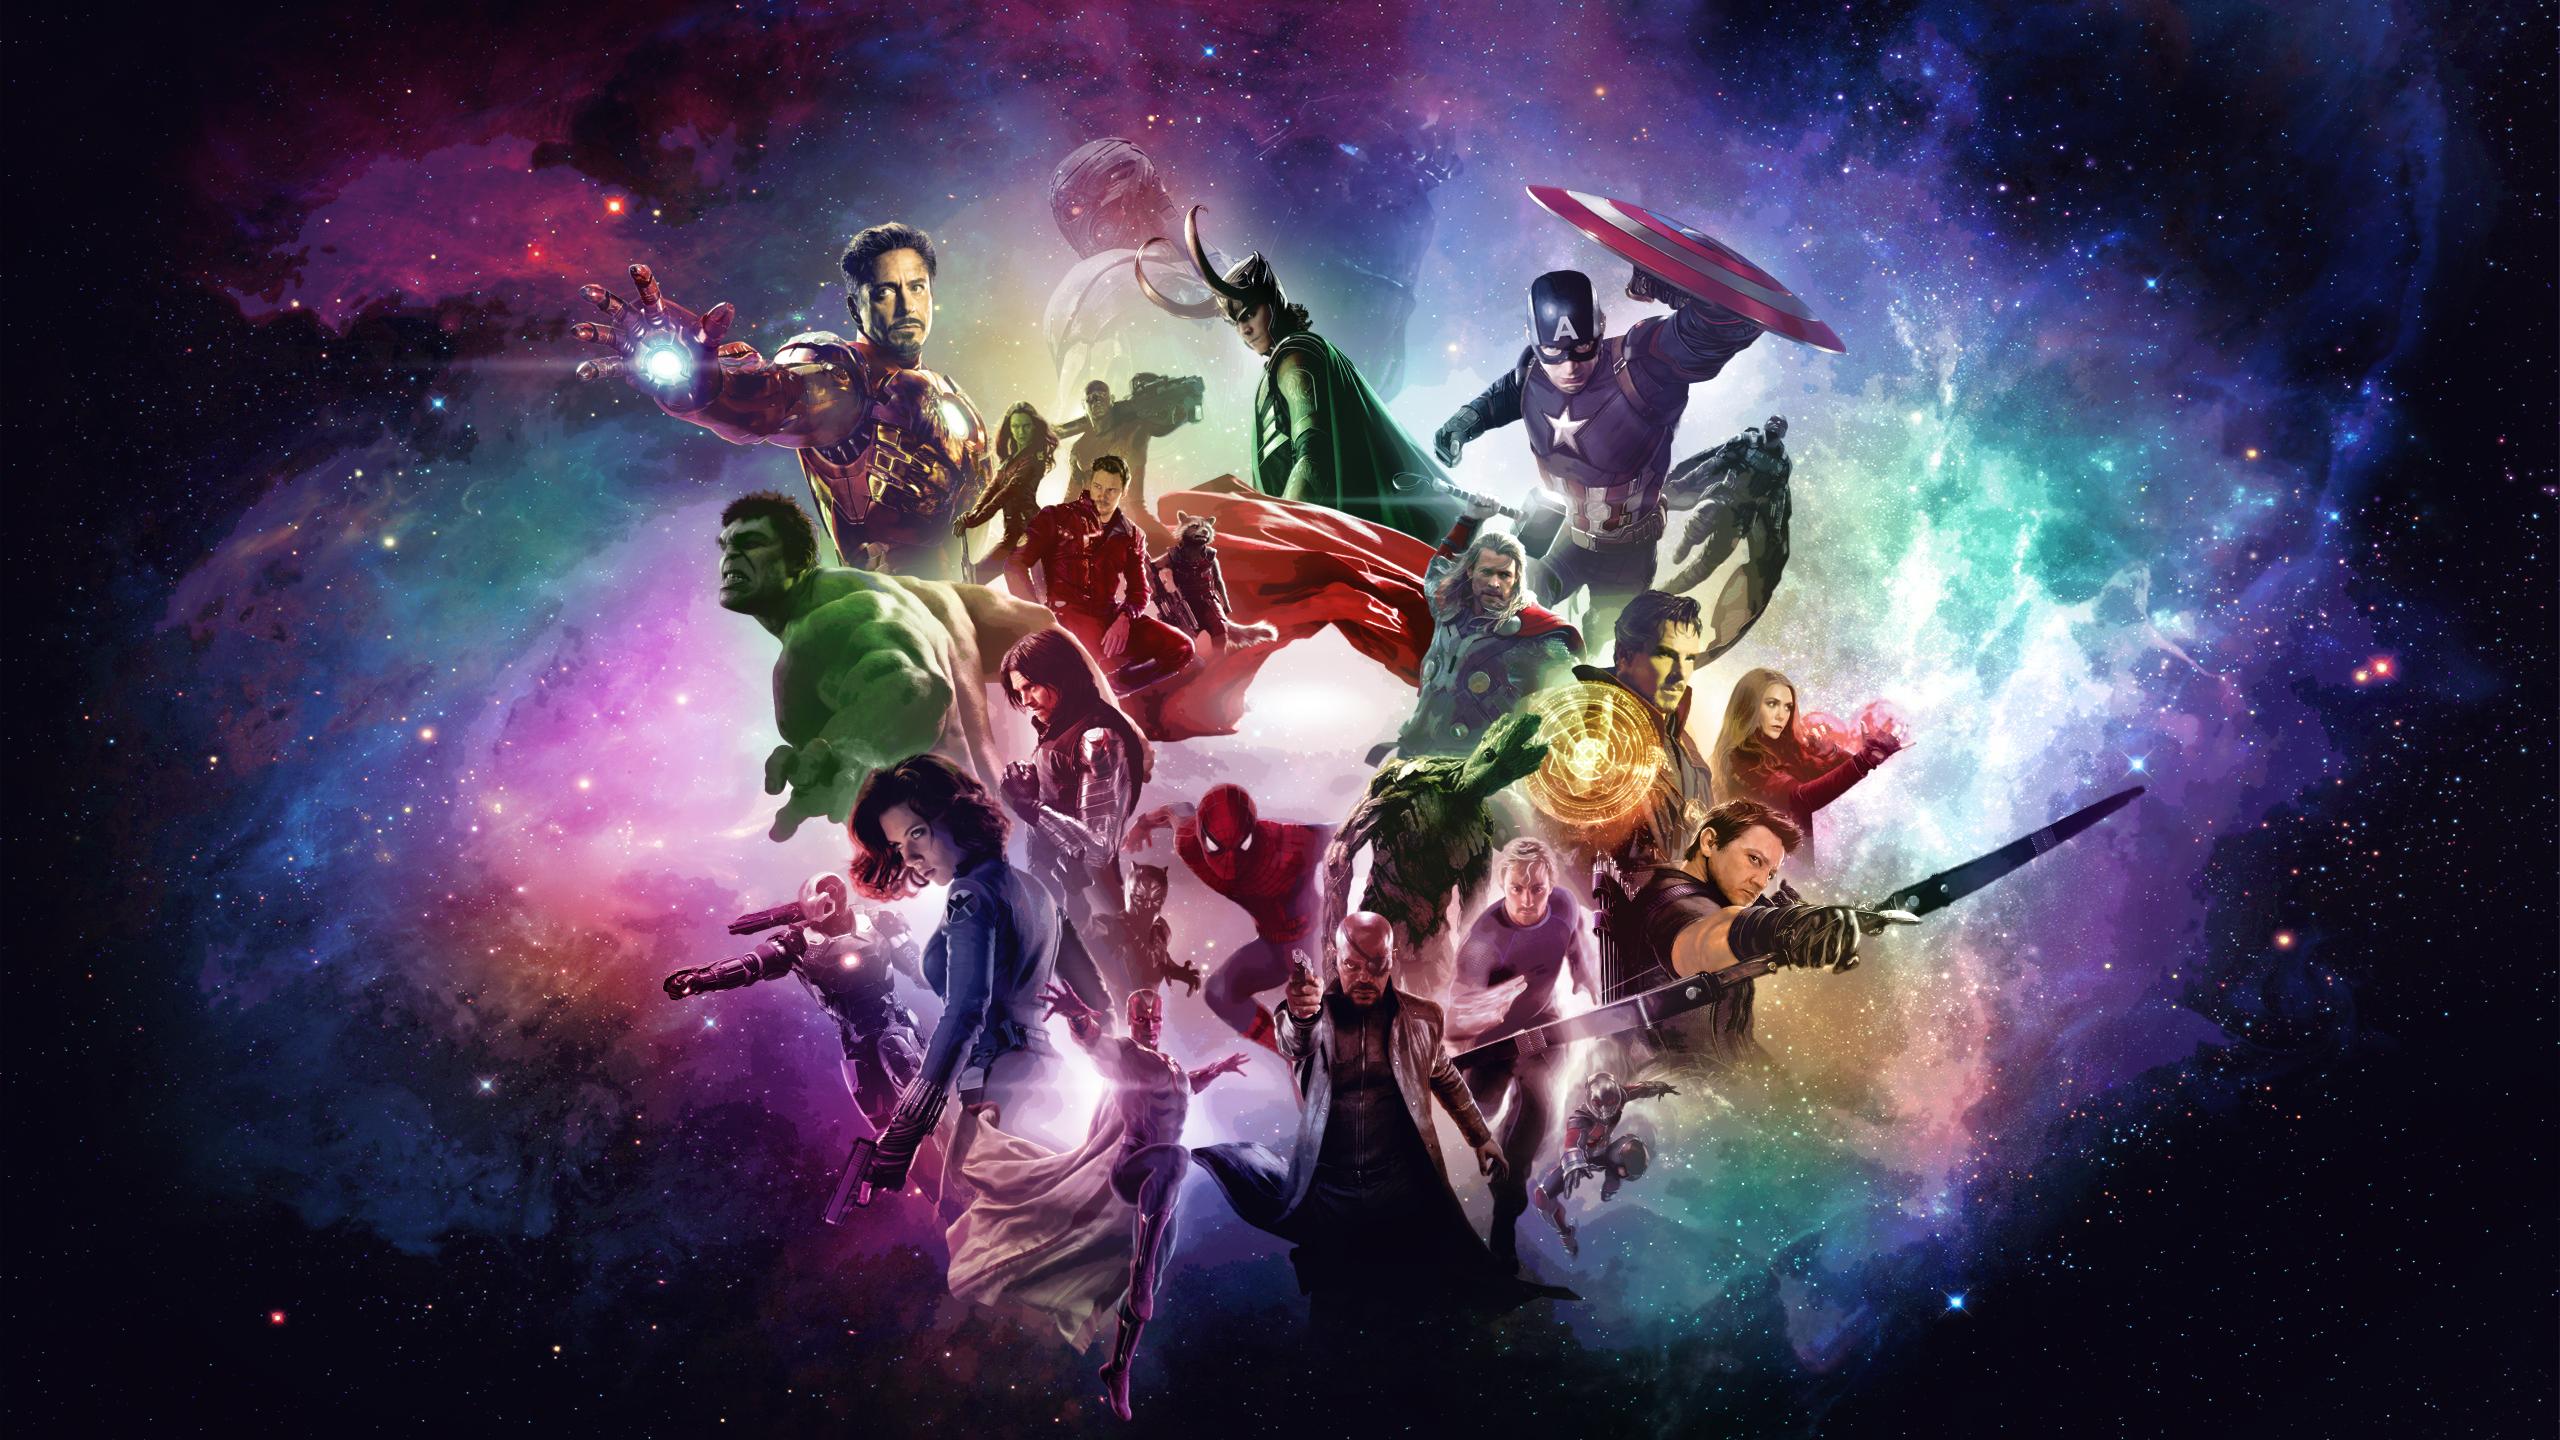 Marvel Cinematic Universe Wallpaper [2560x1440] via Classy Bro 2560x1440